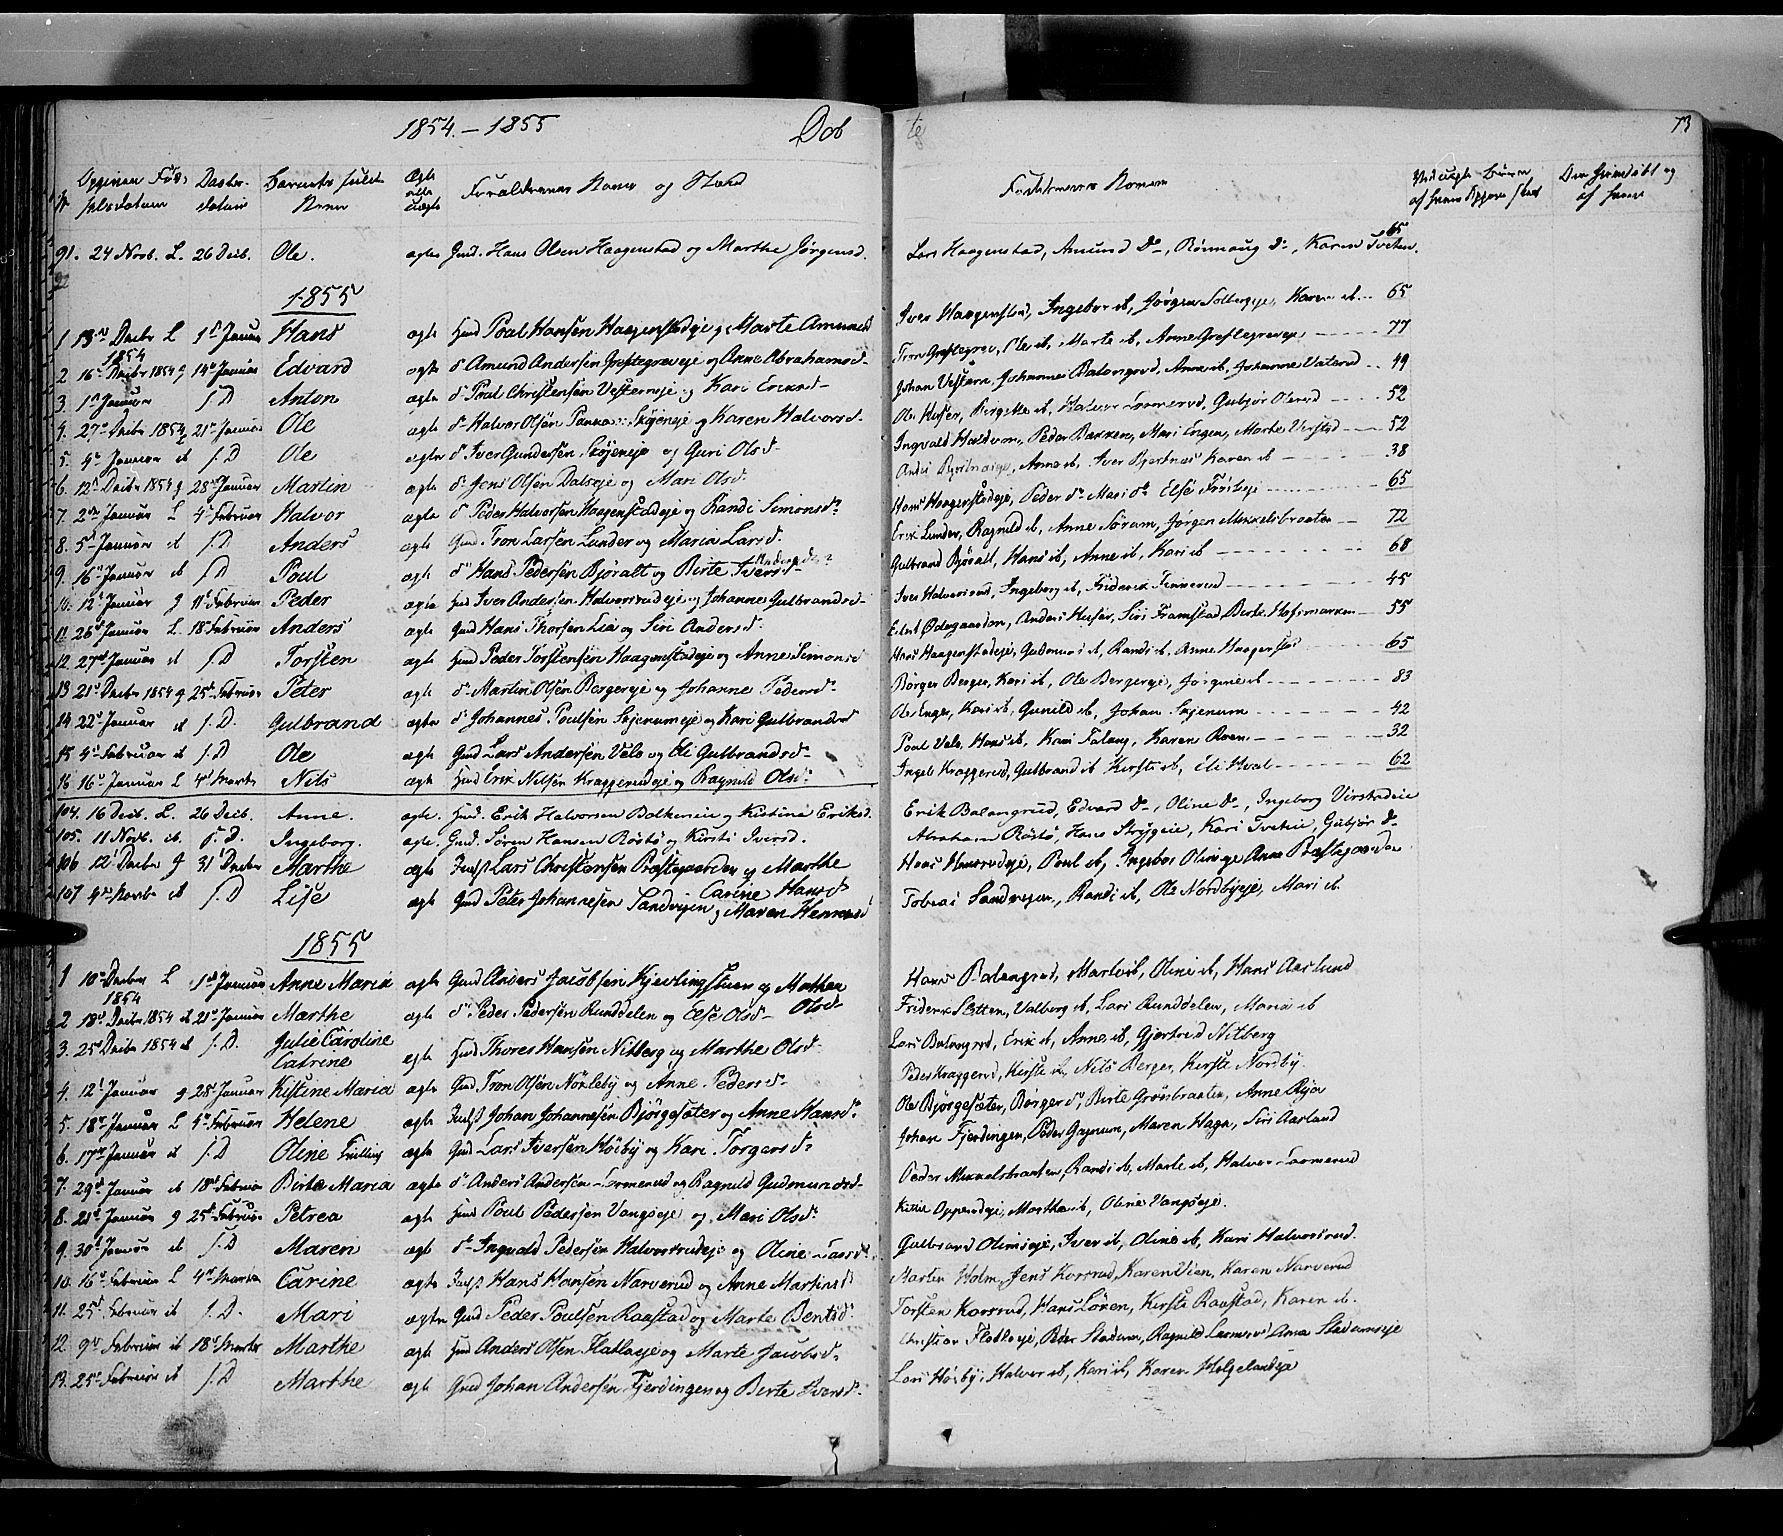 SAH, Jevnaker prestekontor, Ministerialbok nr. 6, 1837-1857, s. 73